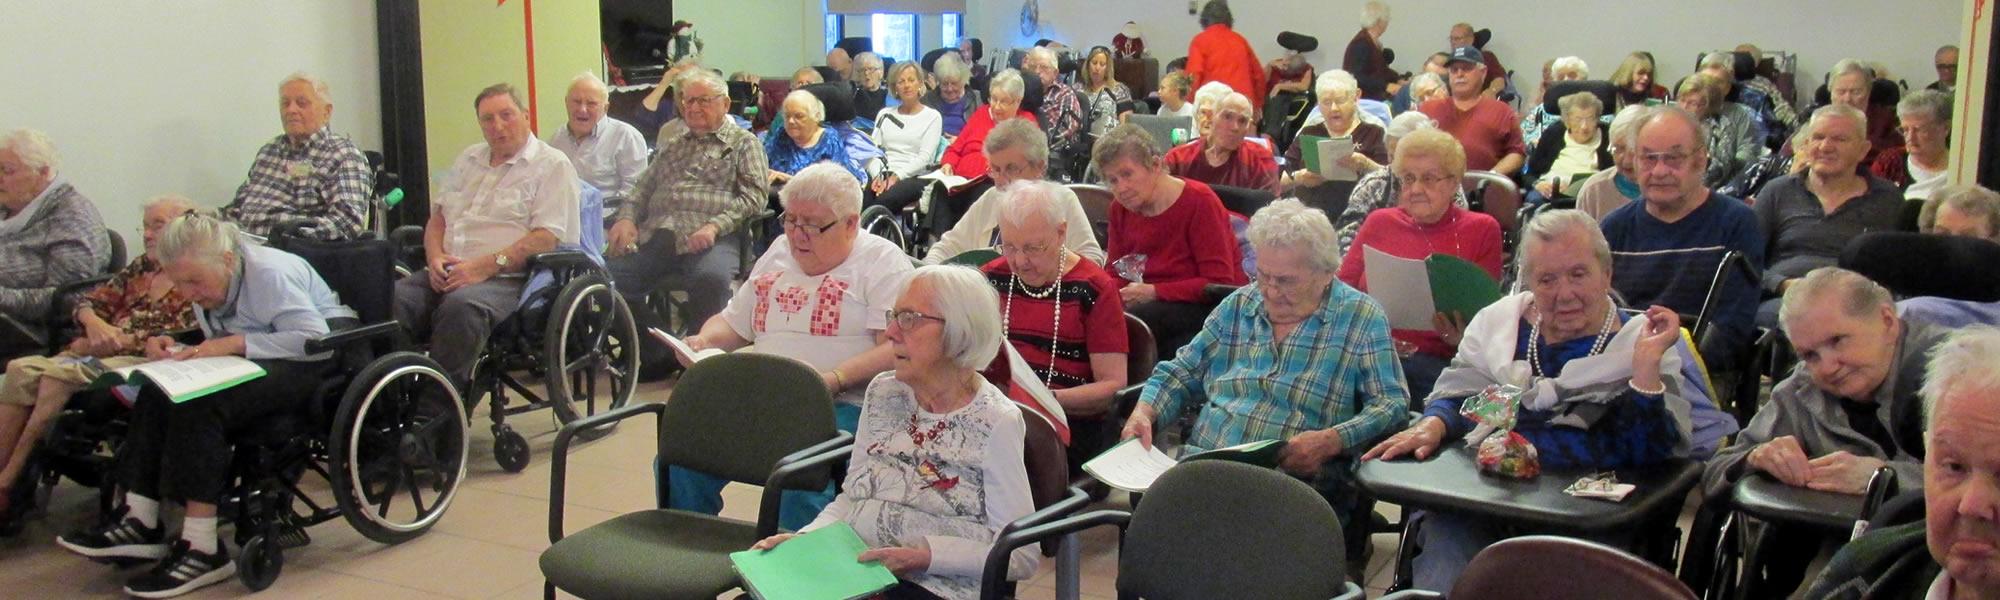 Header Image - valleymanor-header-residents-families-1538629592.jpg